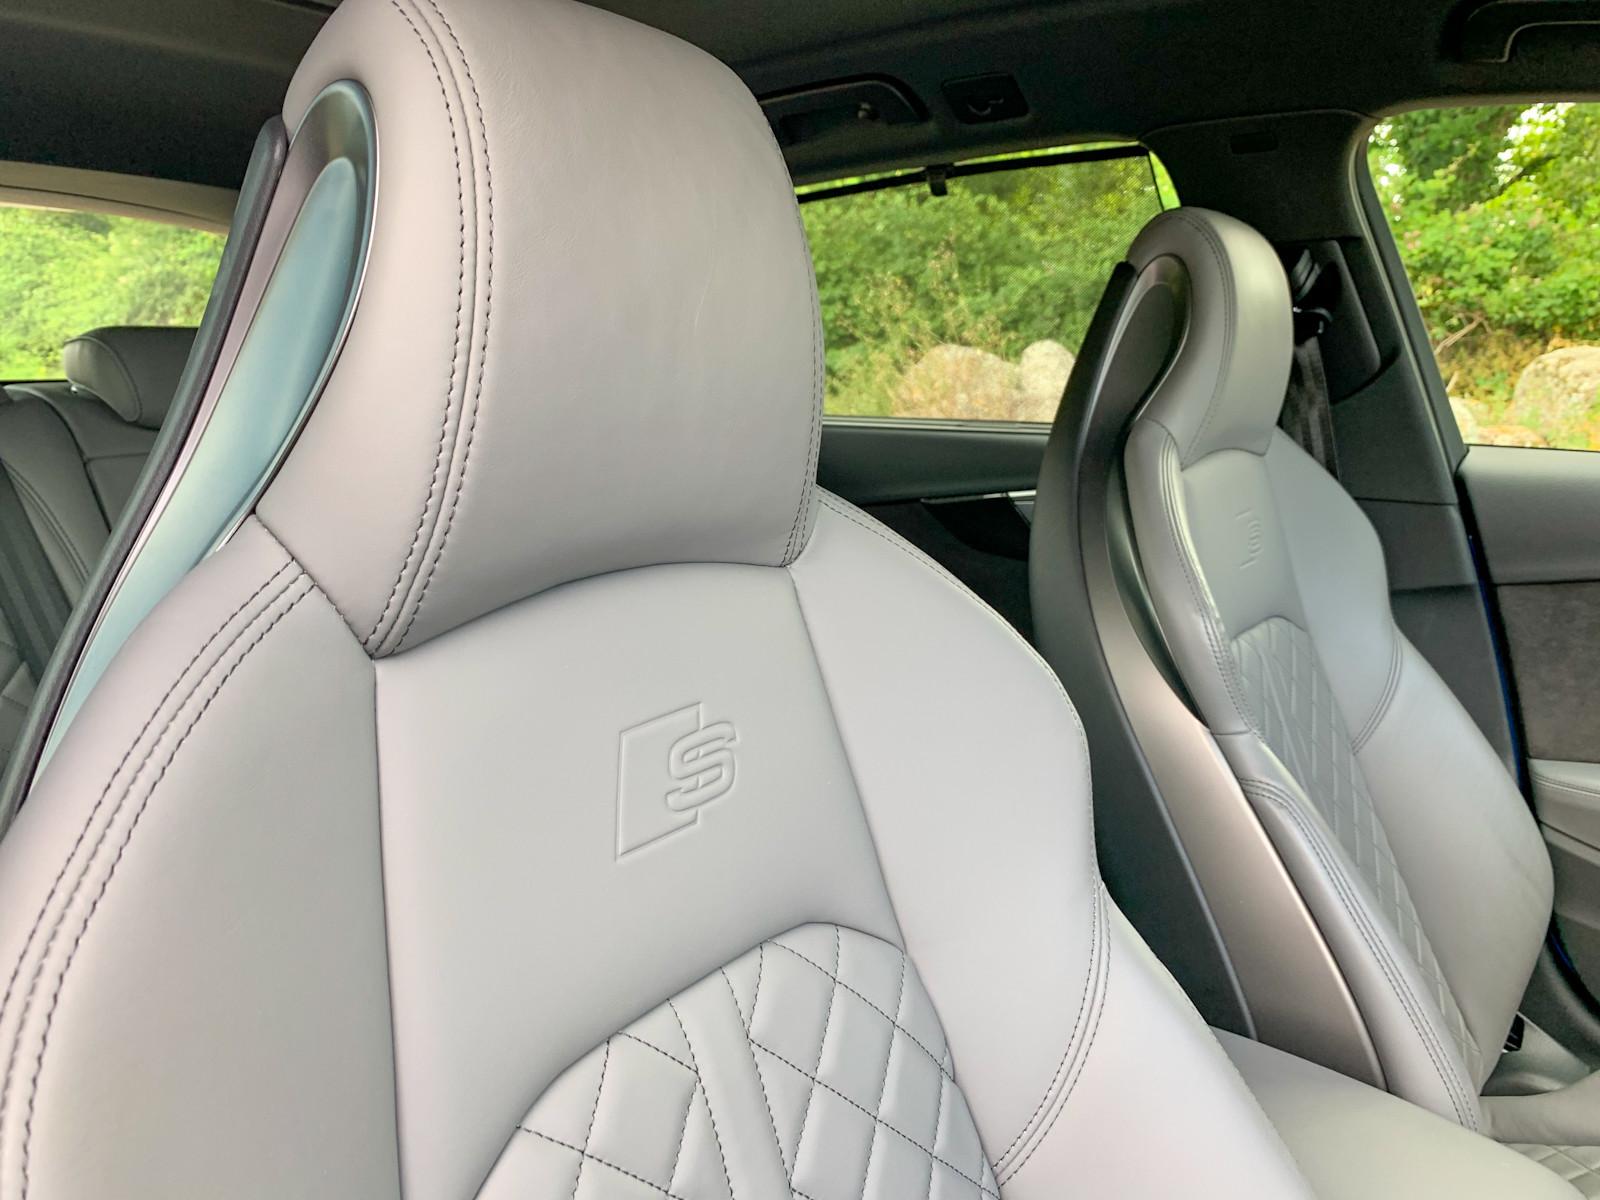 Foto de Audi S4 Avant 2020 (prueba) (21/26)